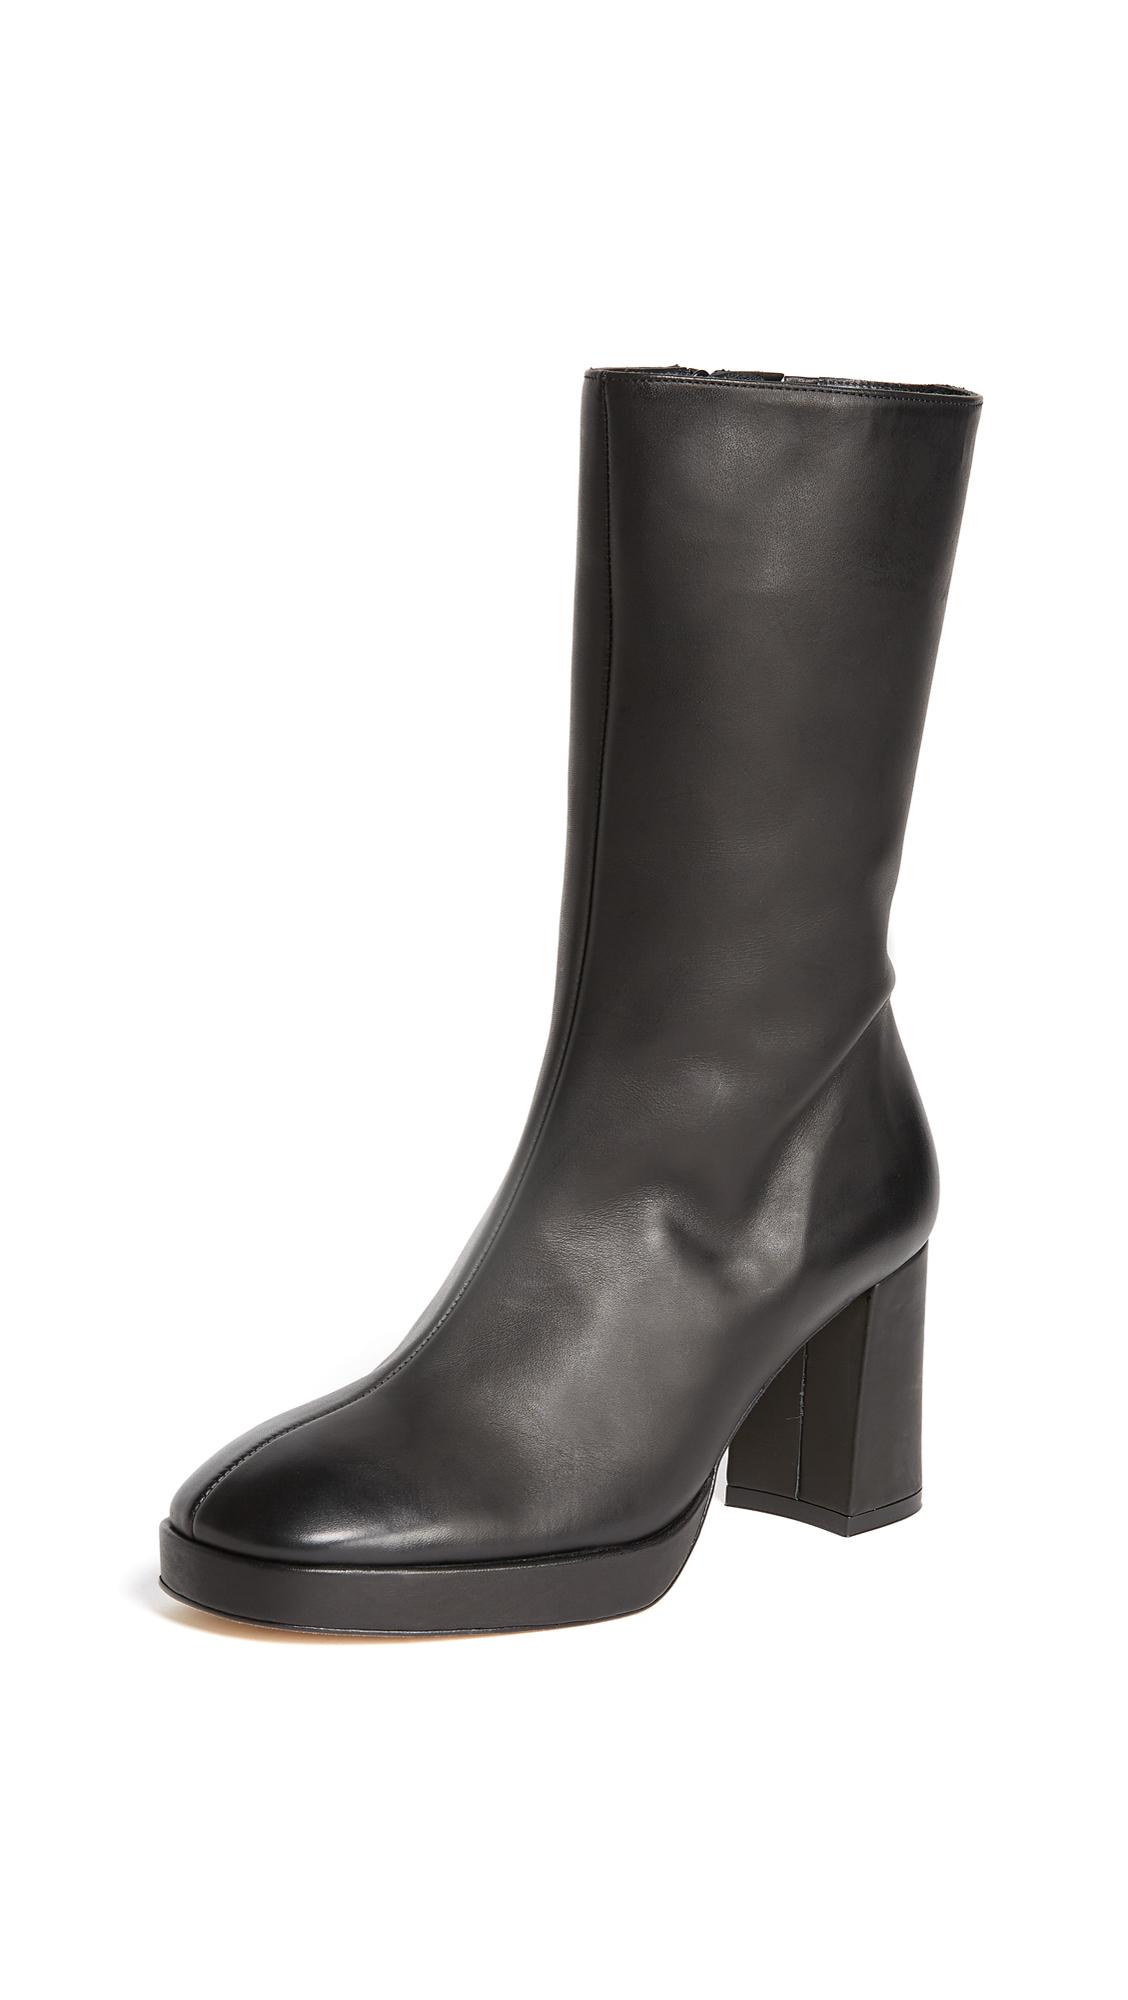 Miista Carlota Block Heel Boots - Black